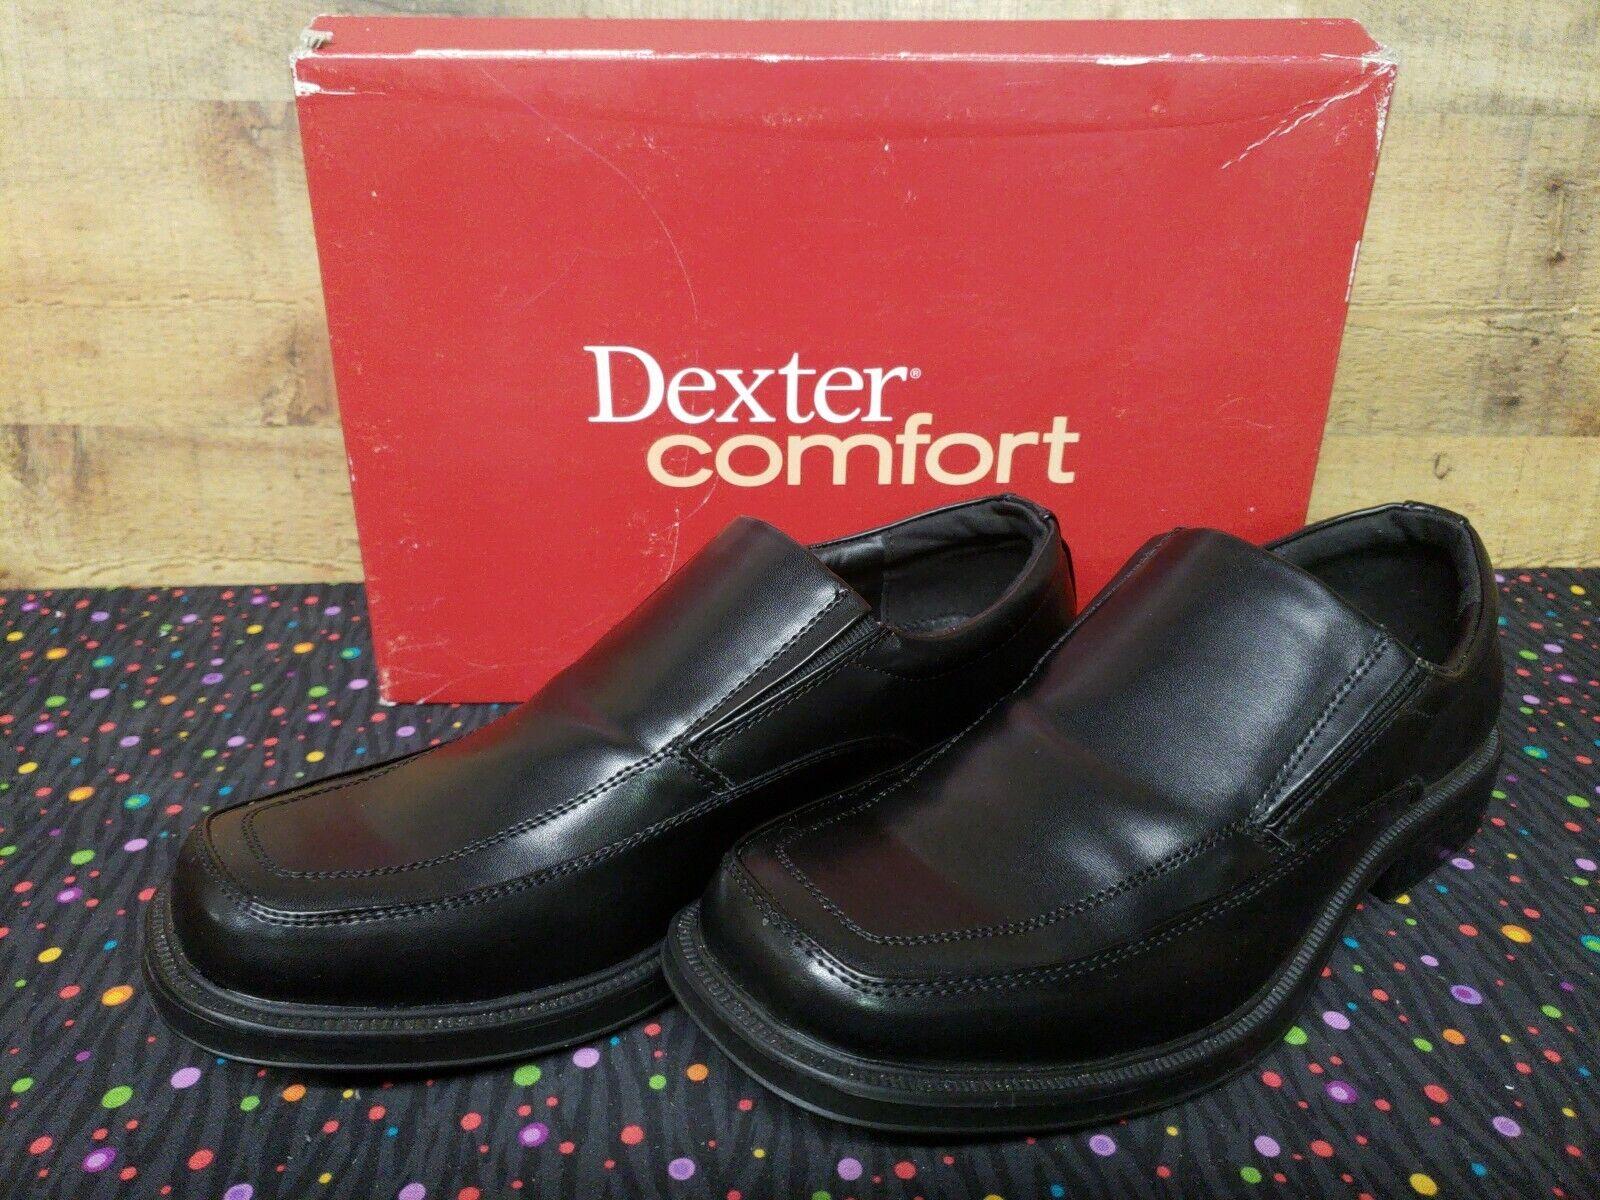 Dexter Comfort 159157 Spencer Slipon Dress Mens shoes Size 9.5 New With Box